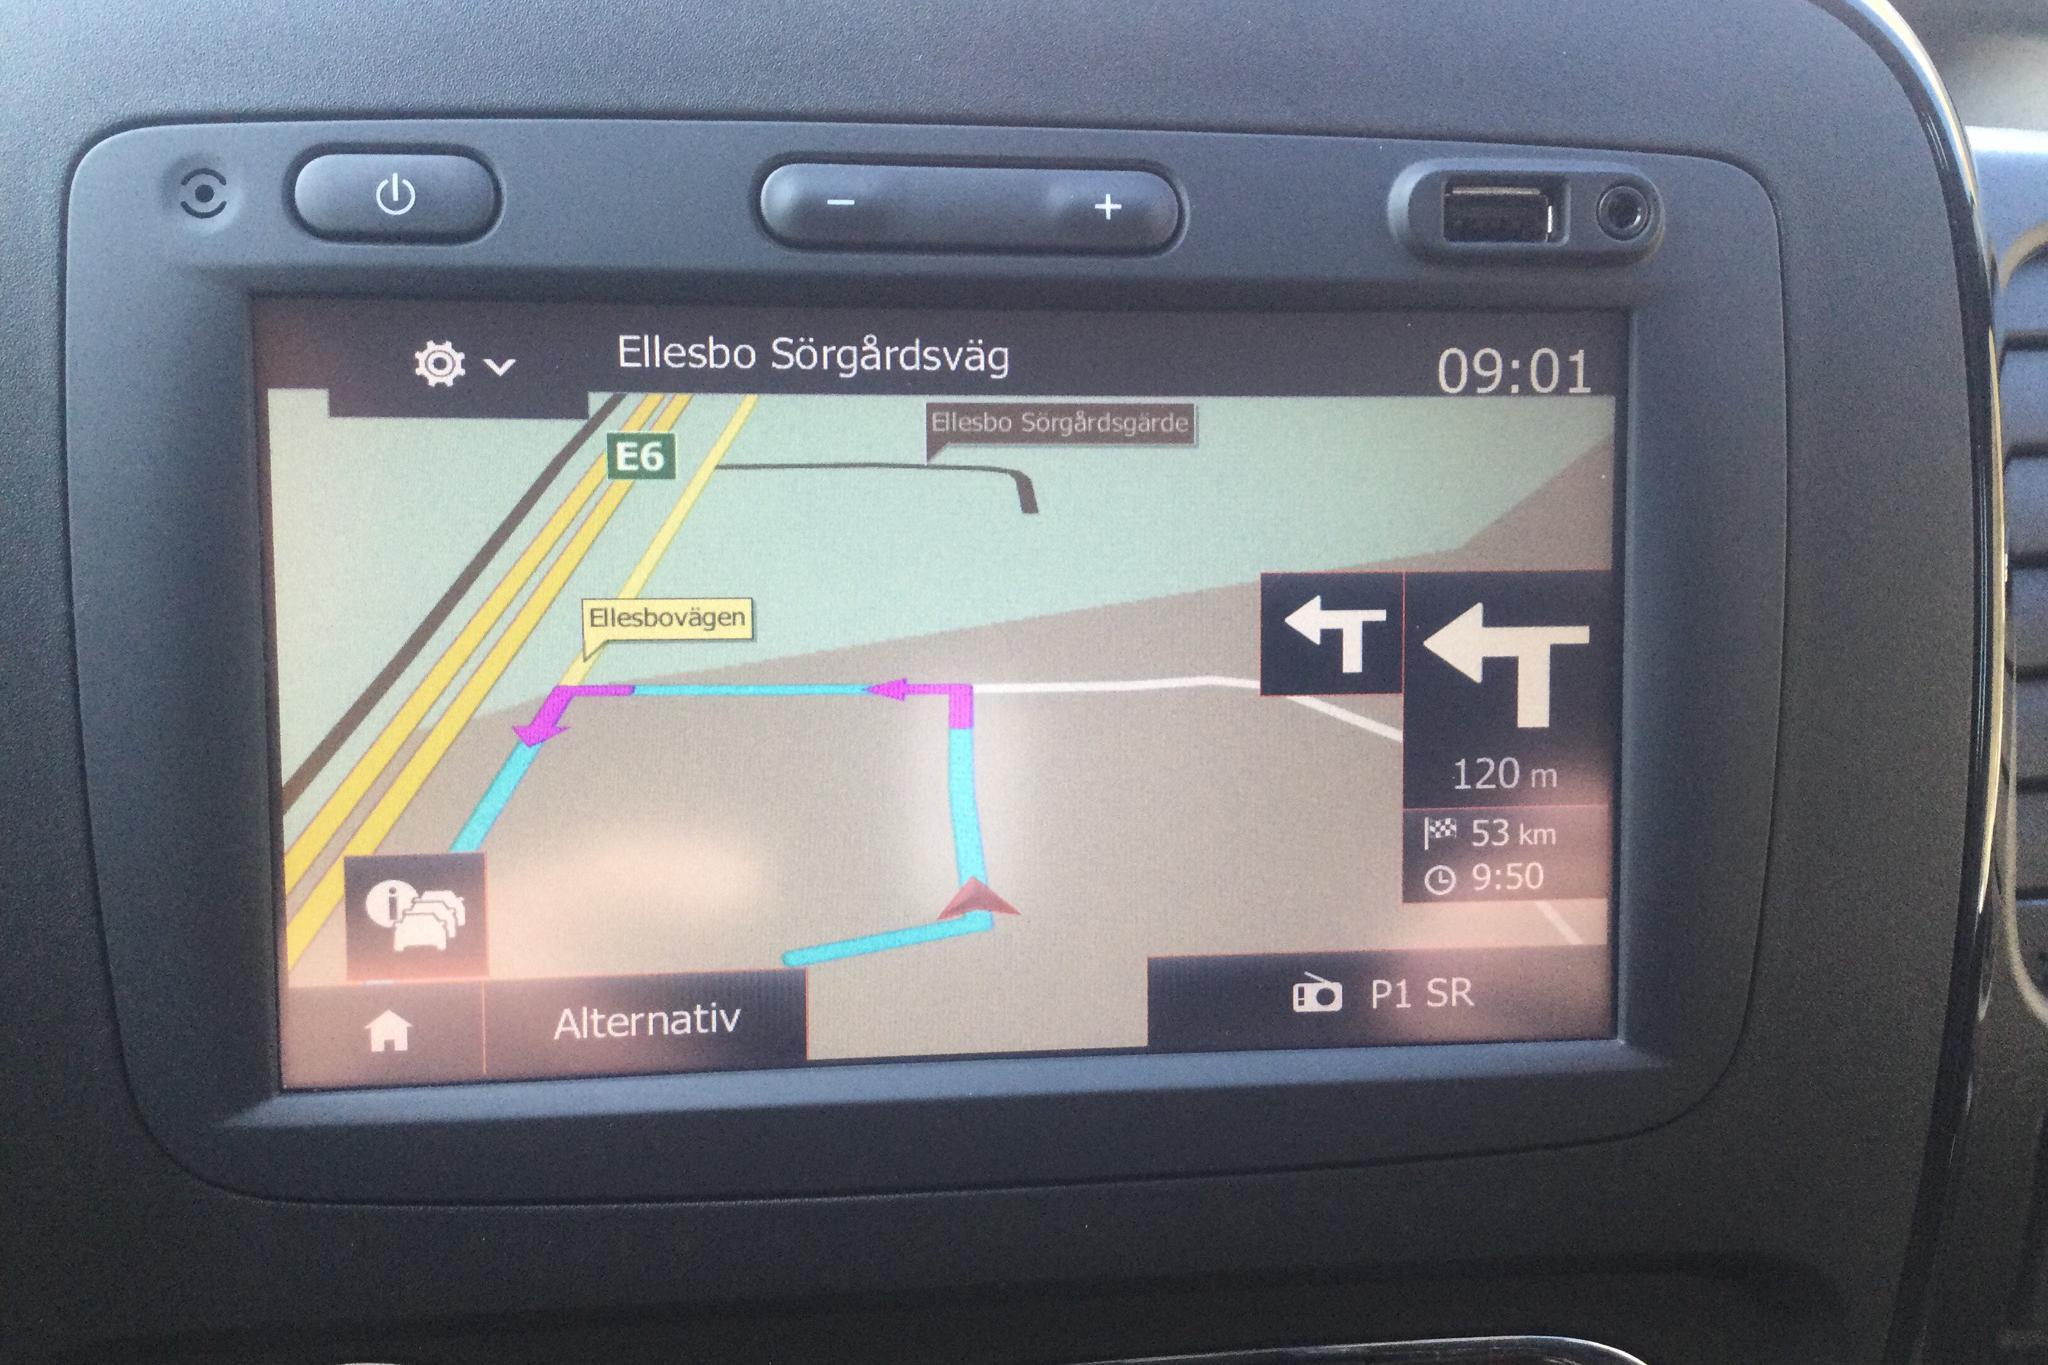 Opel Vivaro 1.6 BITURBO (140hk) - 141 370 km - Manual - white - 2016